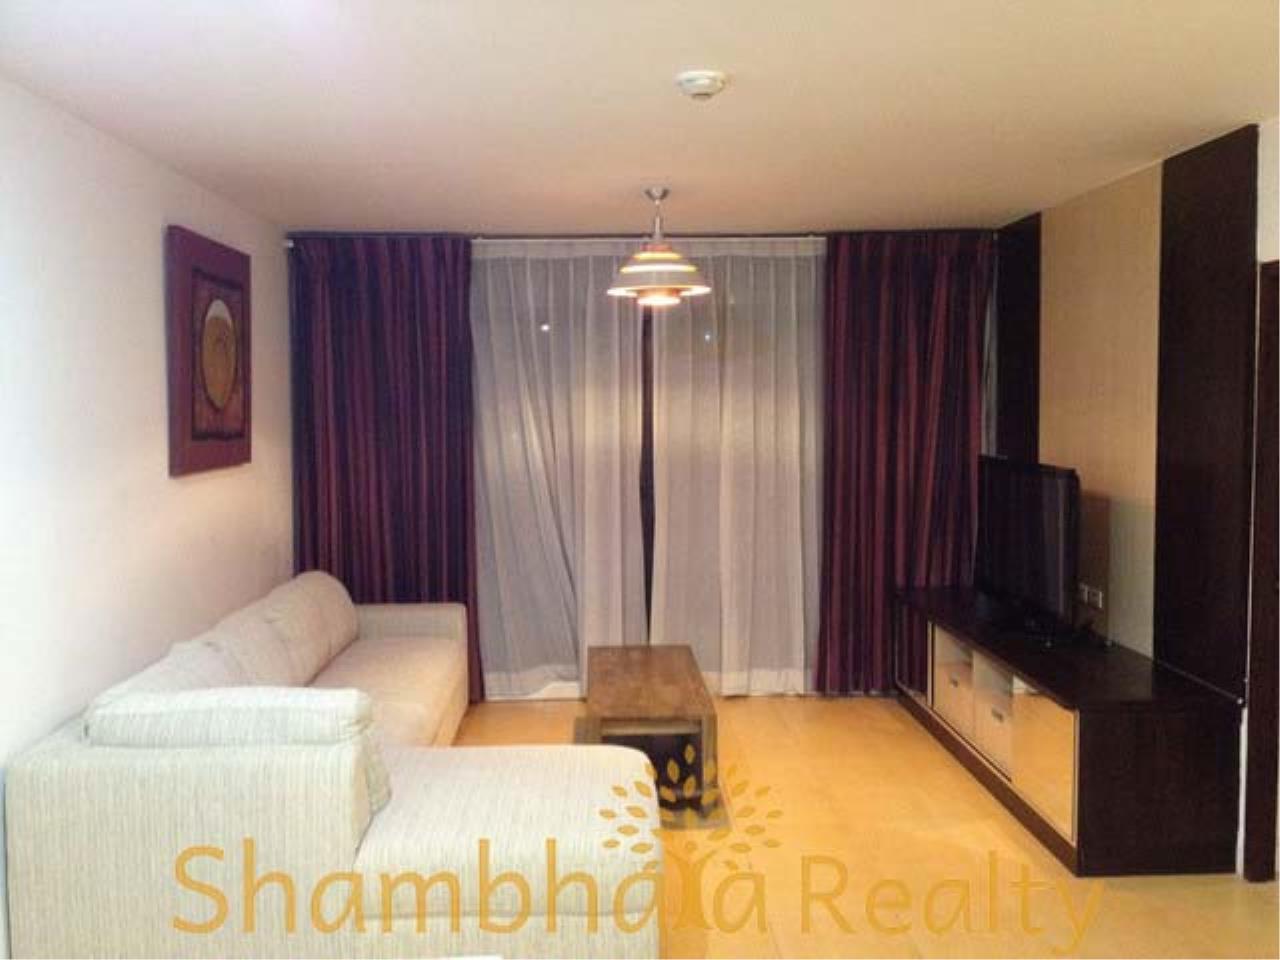 Shambhala Realty Agency's J.C. Tower Condominium for Rent 2